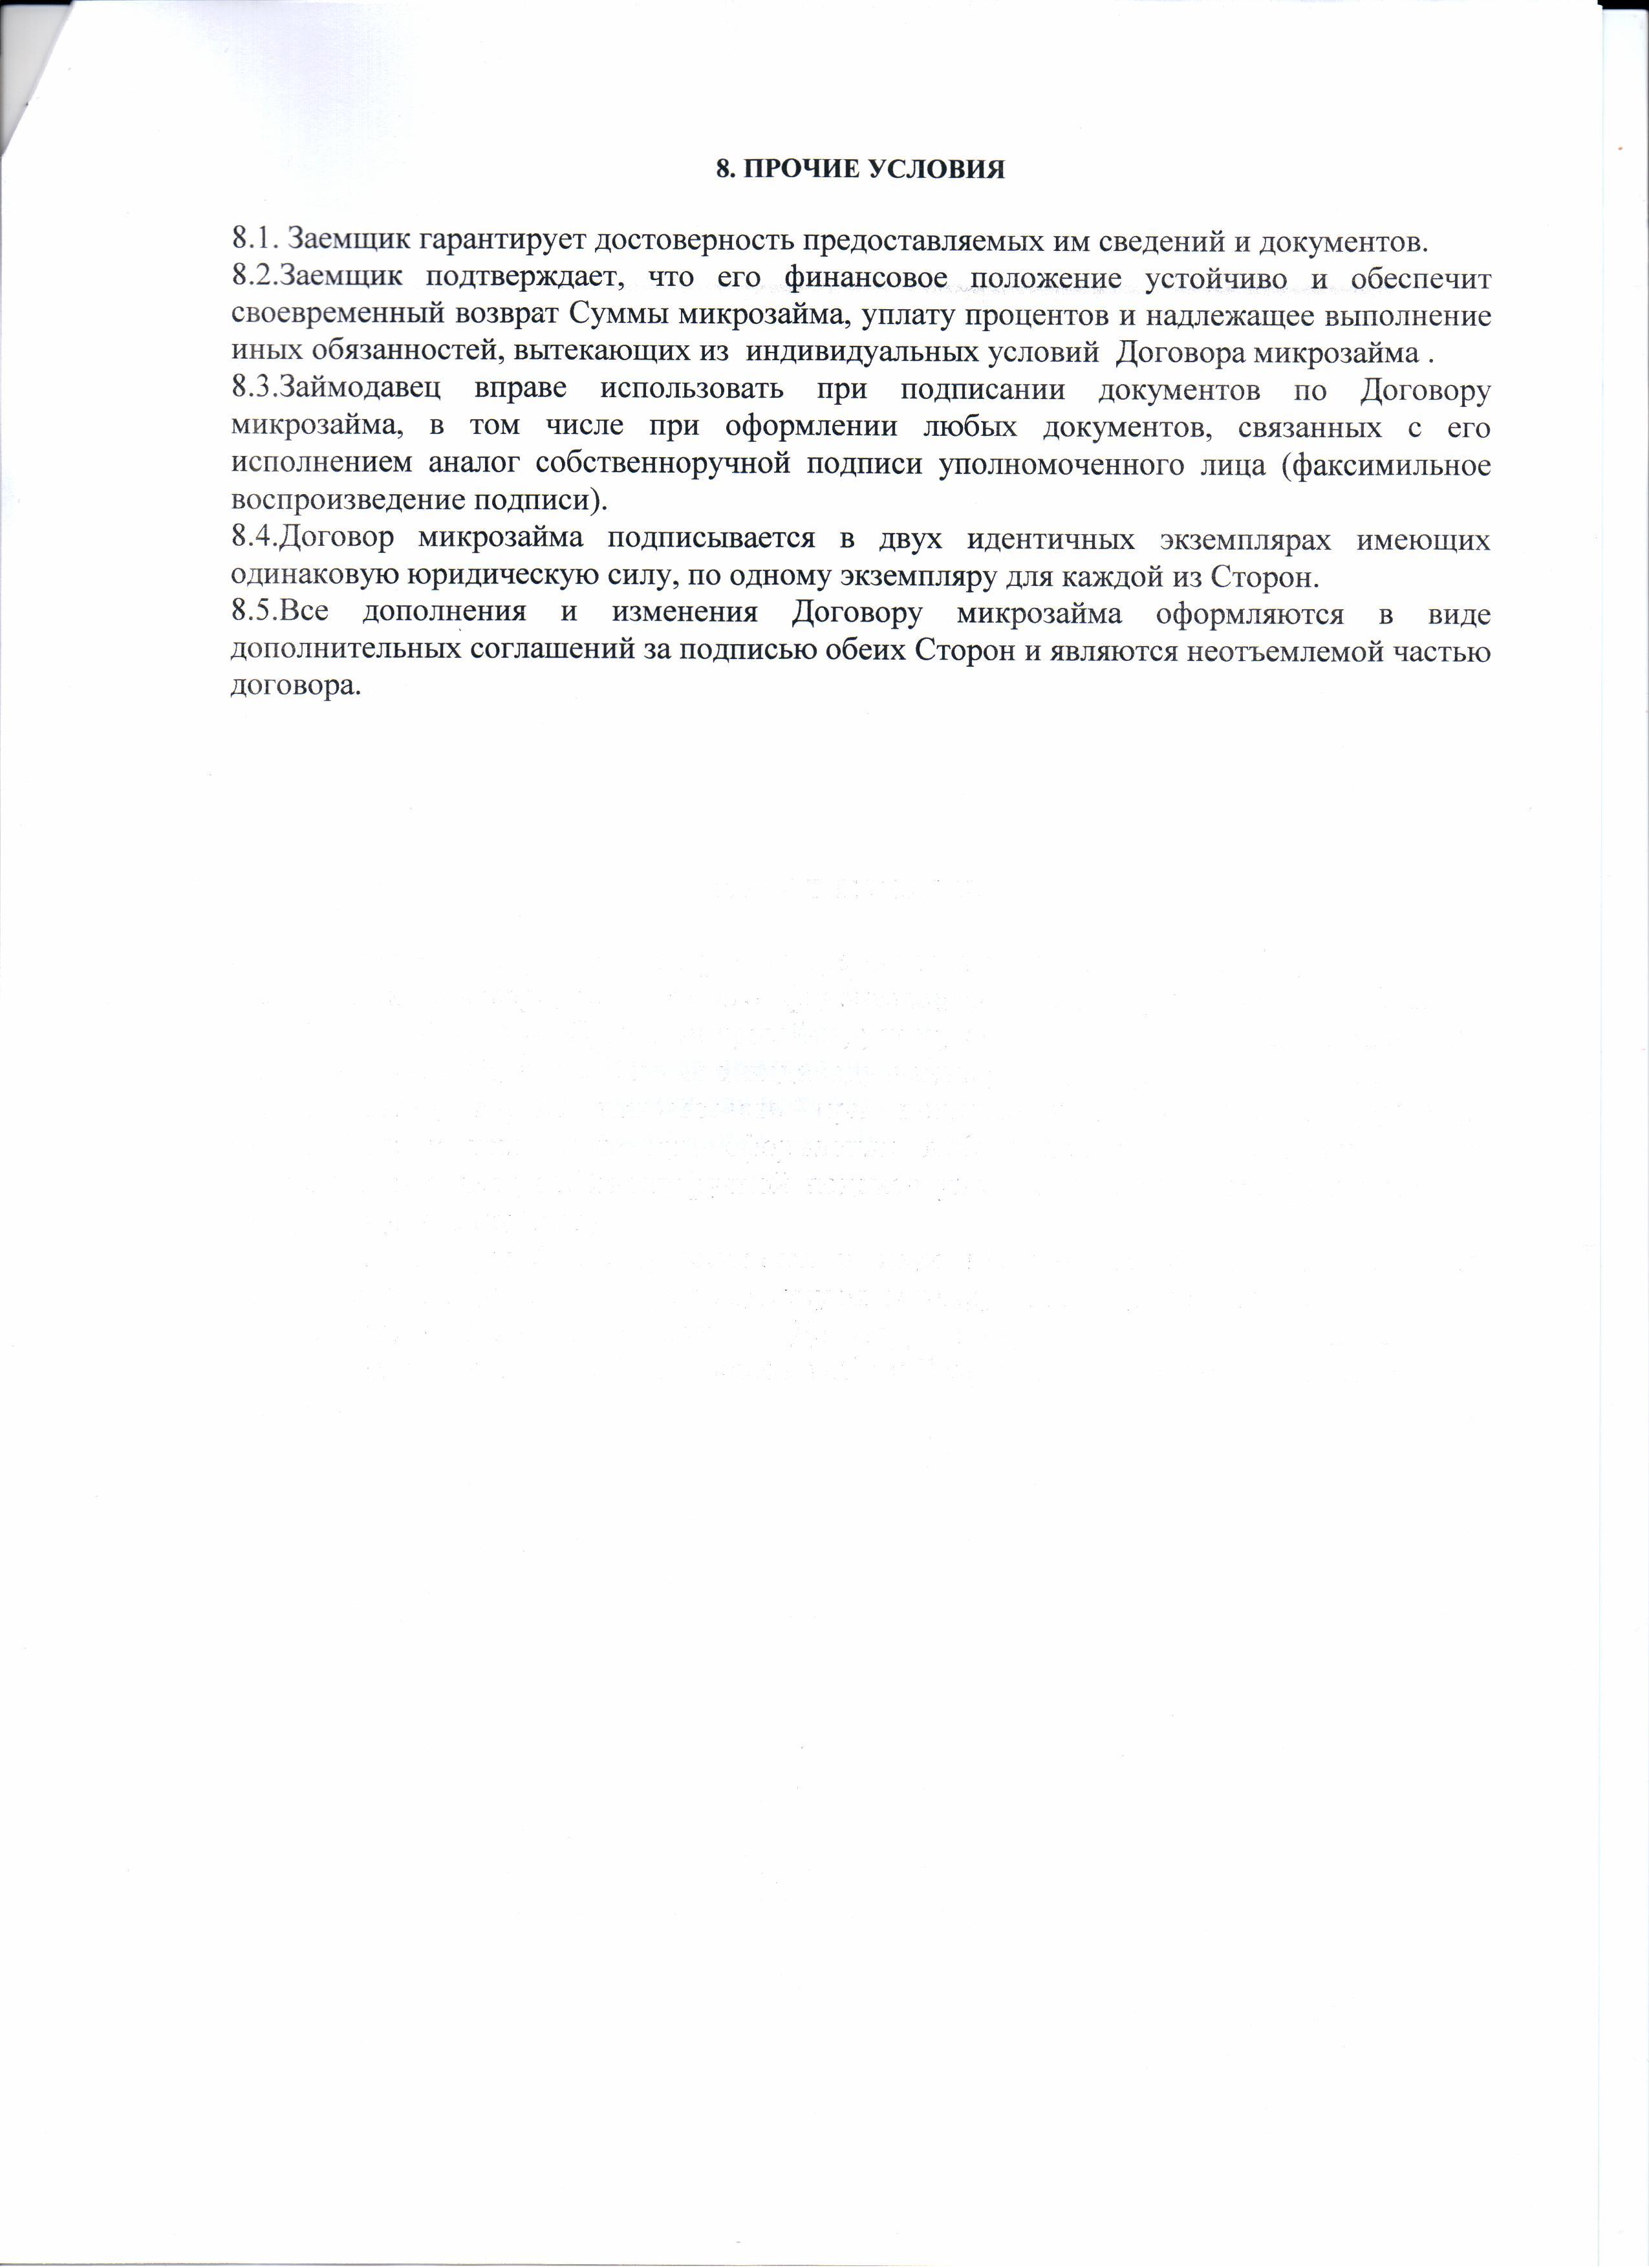 Общие условия договора микрозайма стр5